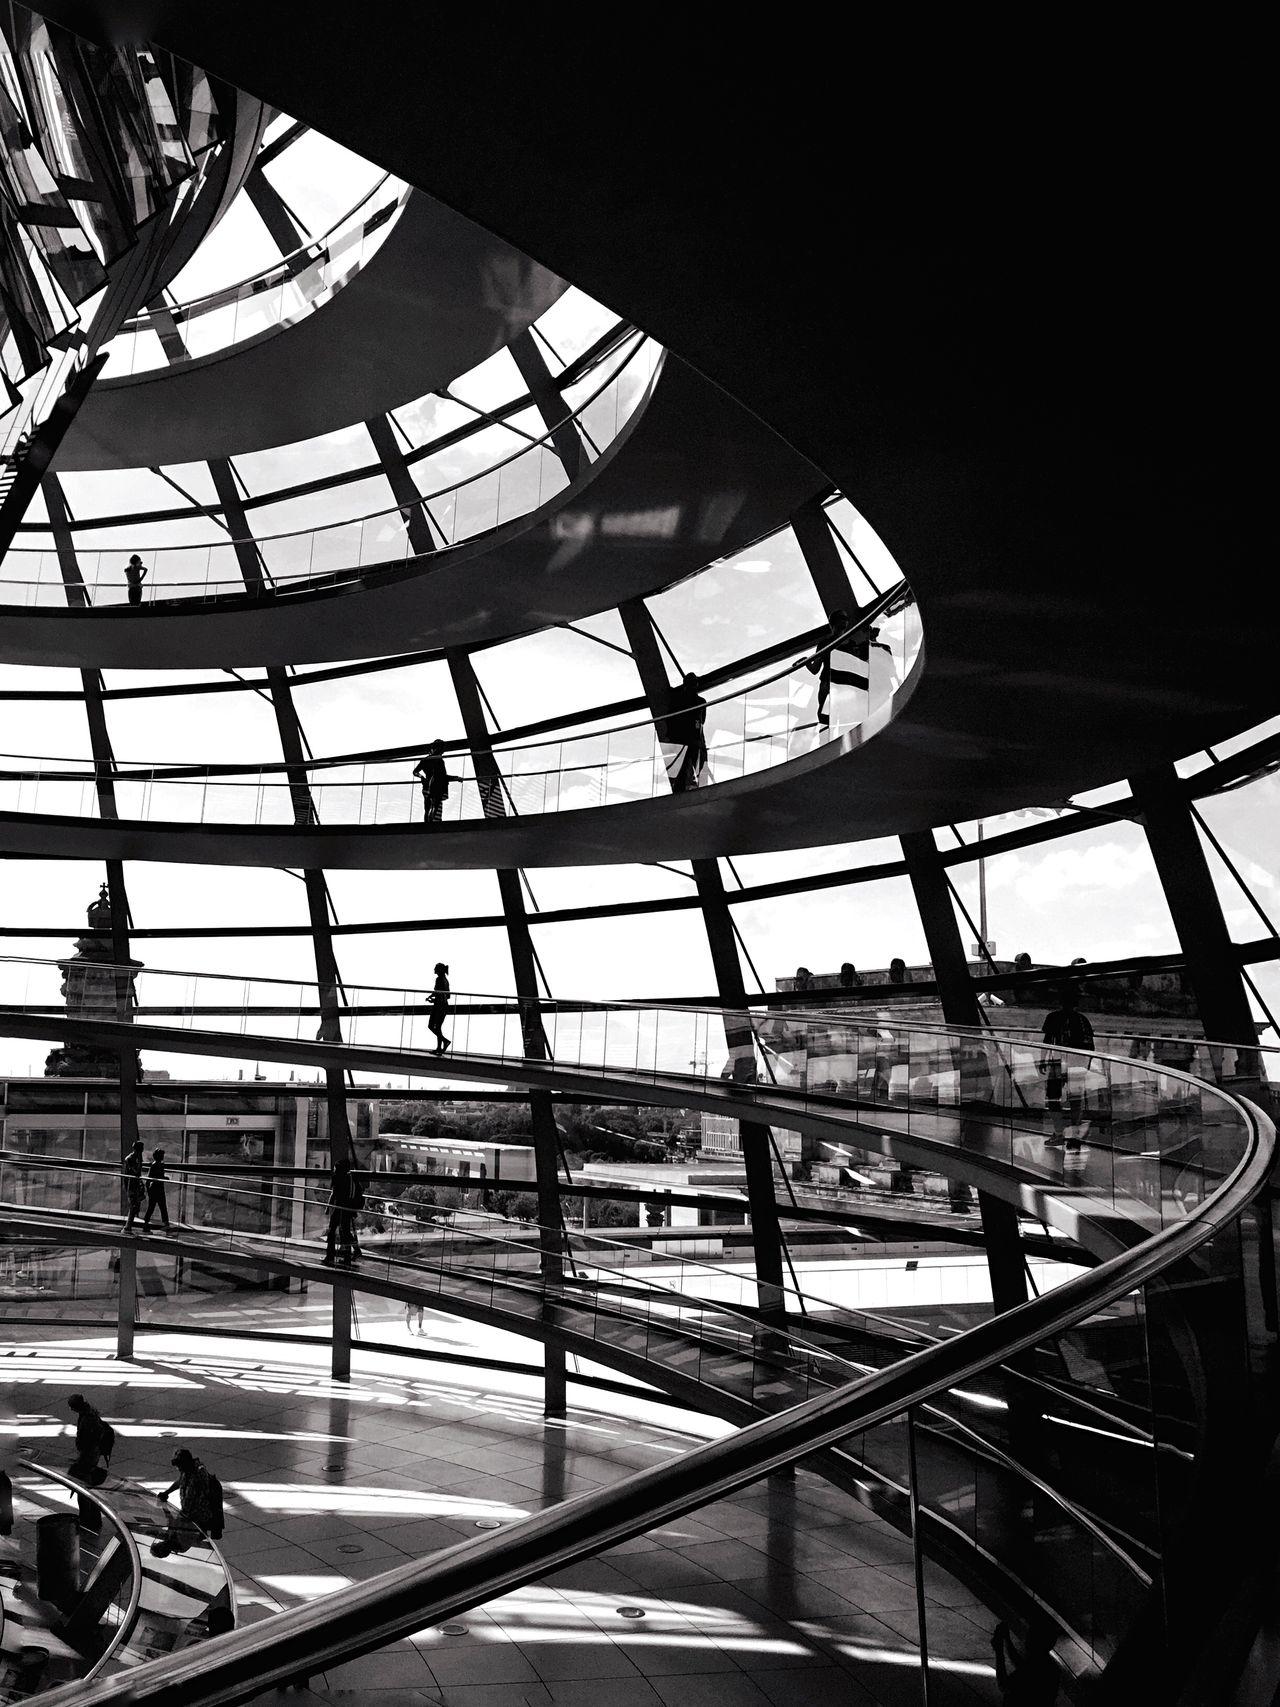 Mp_bundestag Mp-photowalk  The Architect - 2015 EyeEm Awards Architecture Berlin Silhouette Open Edit Mpro Blackandwhite Shades Of Grey